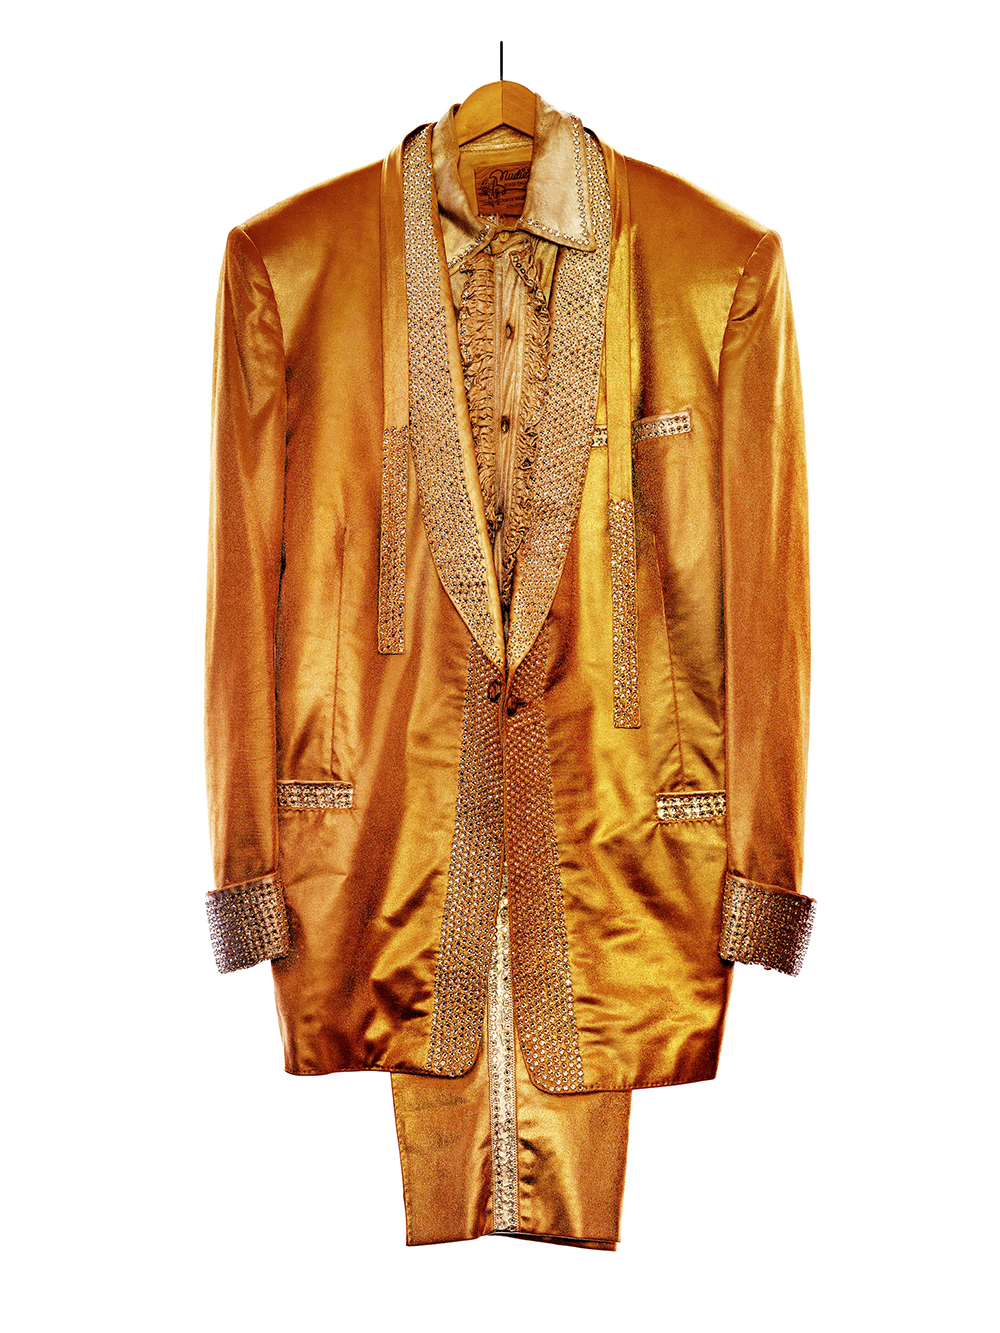 Elvis Presleys Gold lame suit Graceland by Albert Watson  Price on request